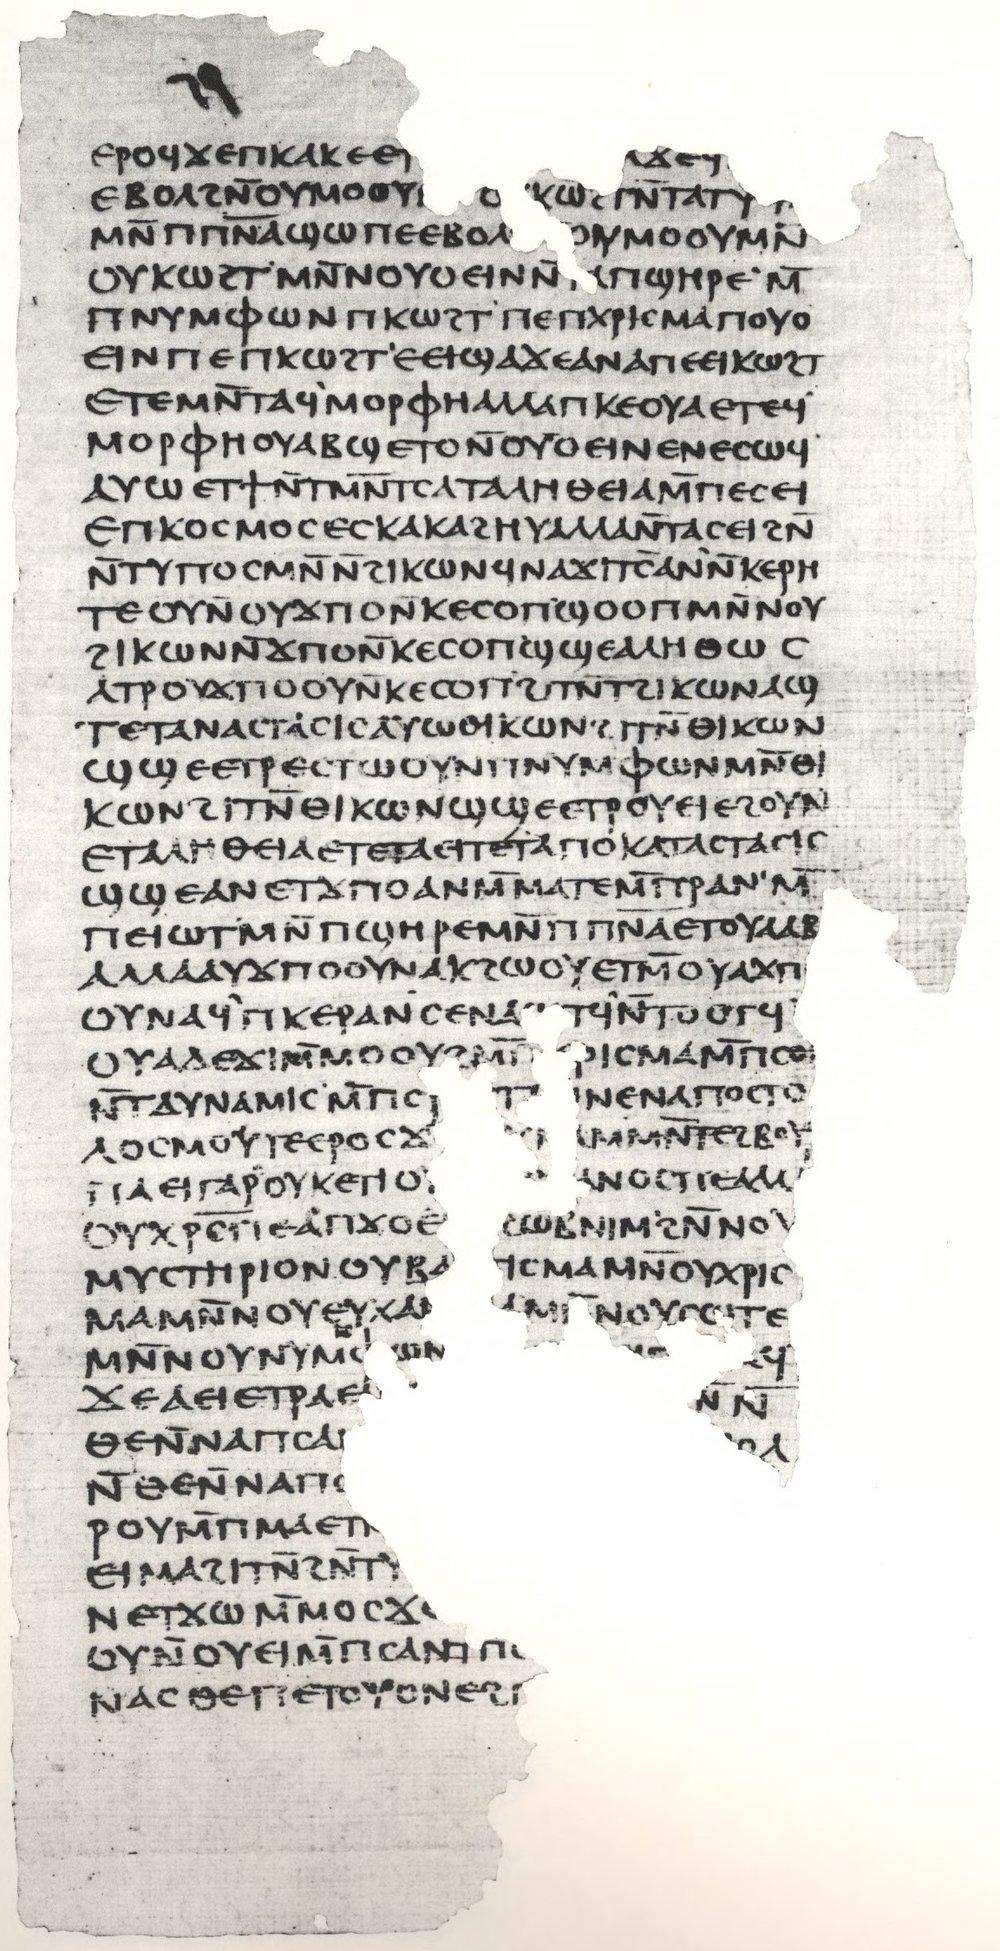 Gospel_of_Philip_facsimile_Page_67.jpg